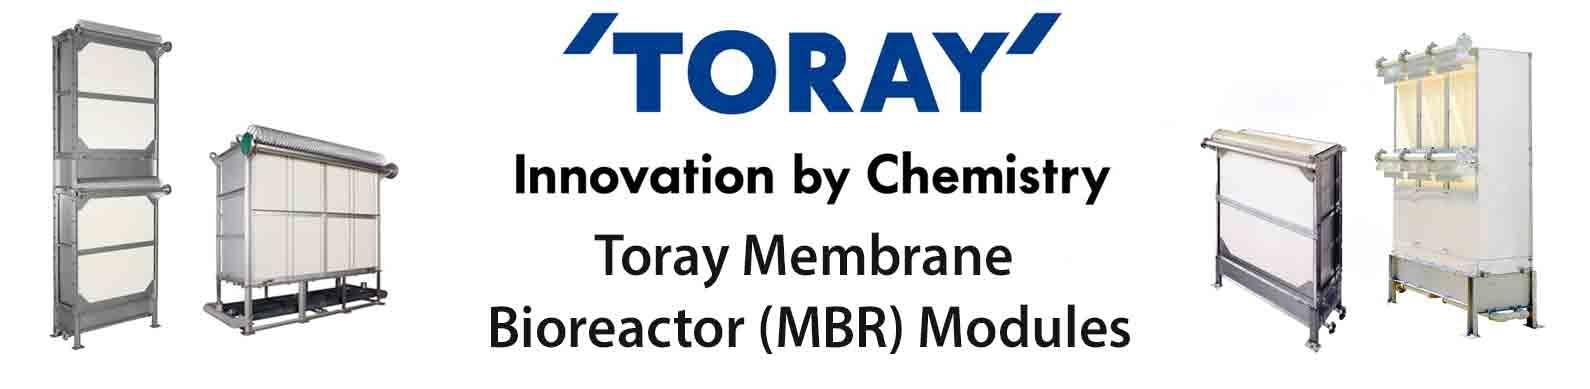 toray-membrane-bioreactor-mbr-modules-banner.jpg